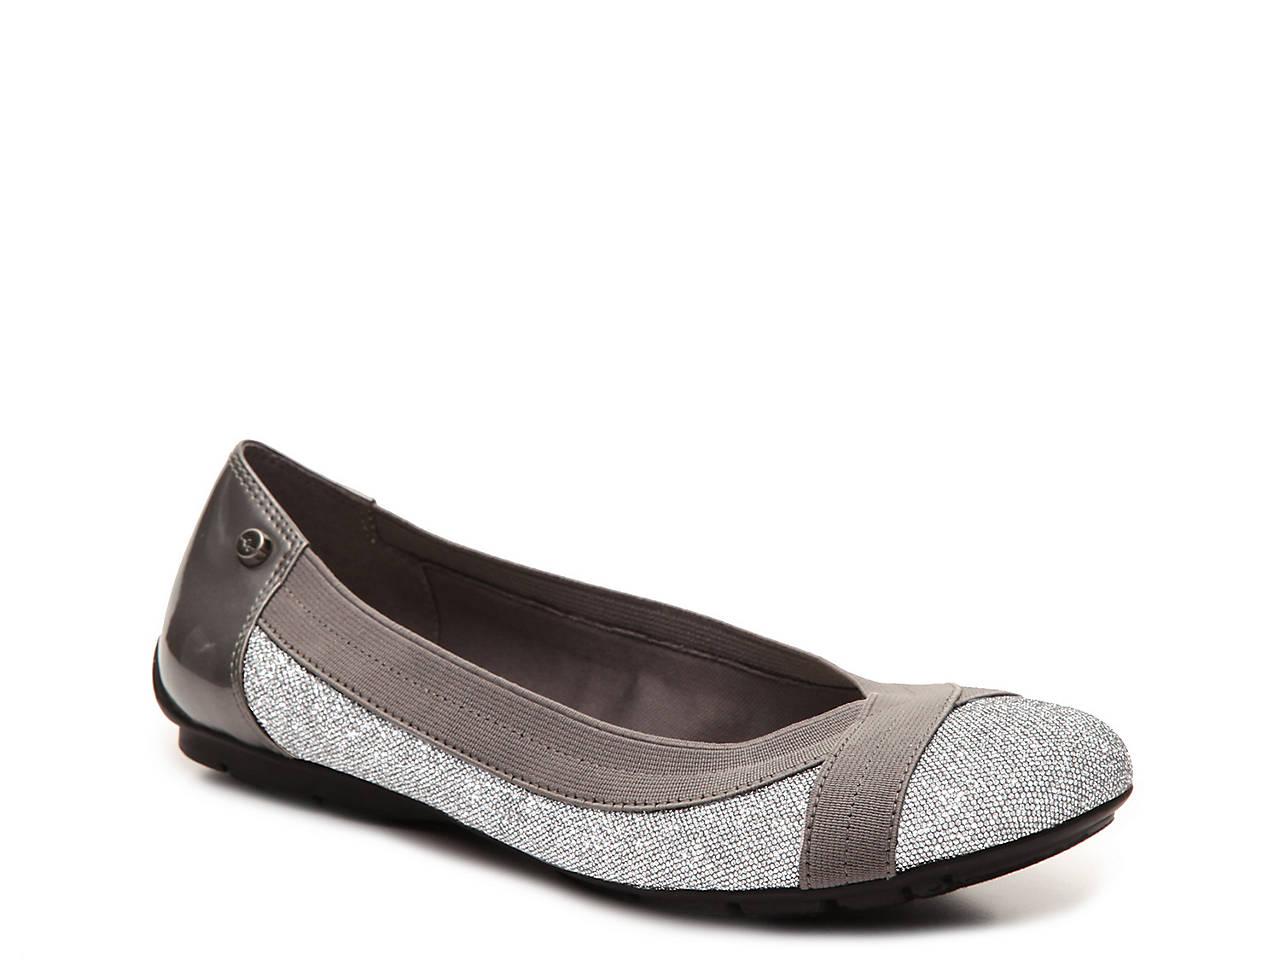 c45aad1aef5 Anne Klein Sport Insure Ballet Flat Women s Shoes